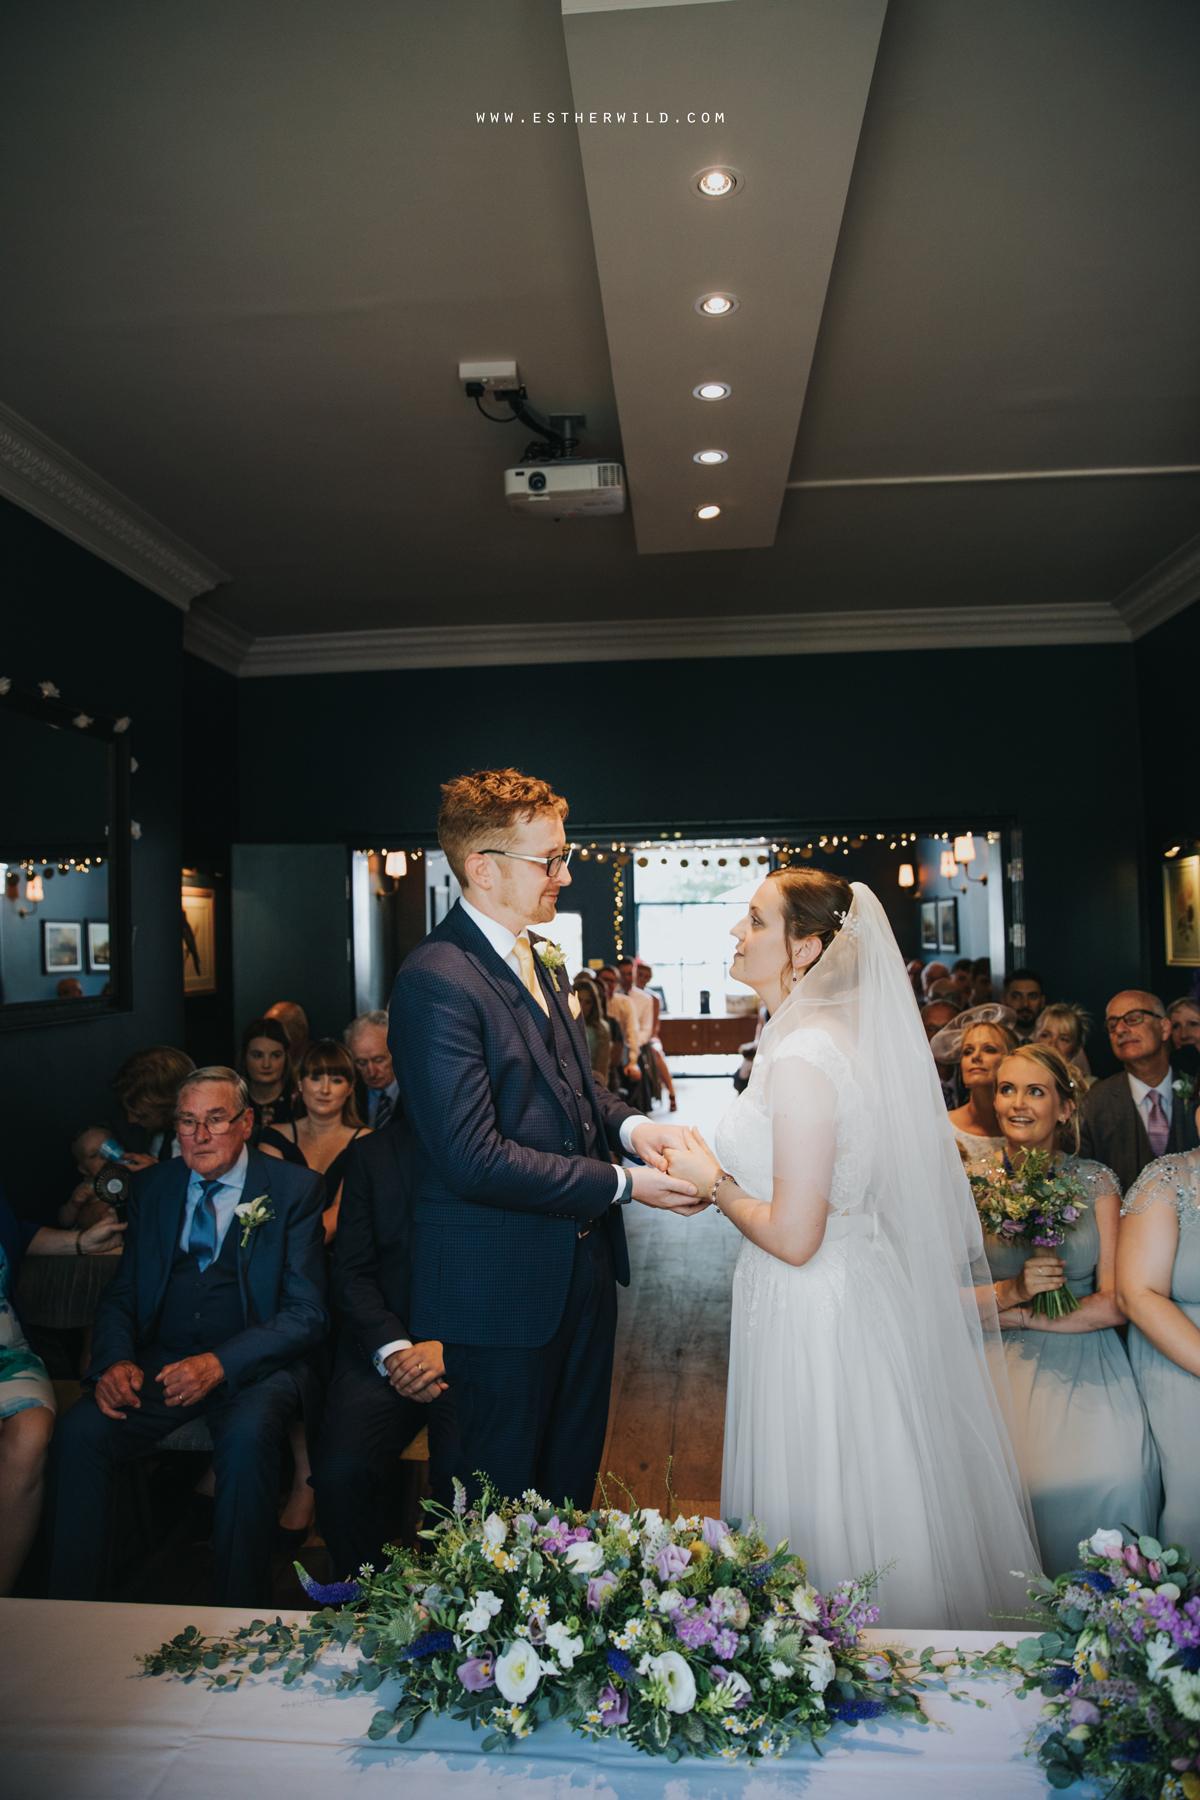 The_Georgian_Townhouse_Wedding_Norwich_Esther_Wild_Photographer_3R8A1070.jpg